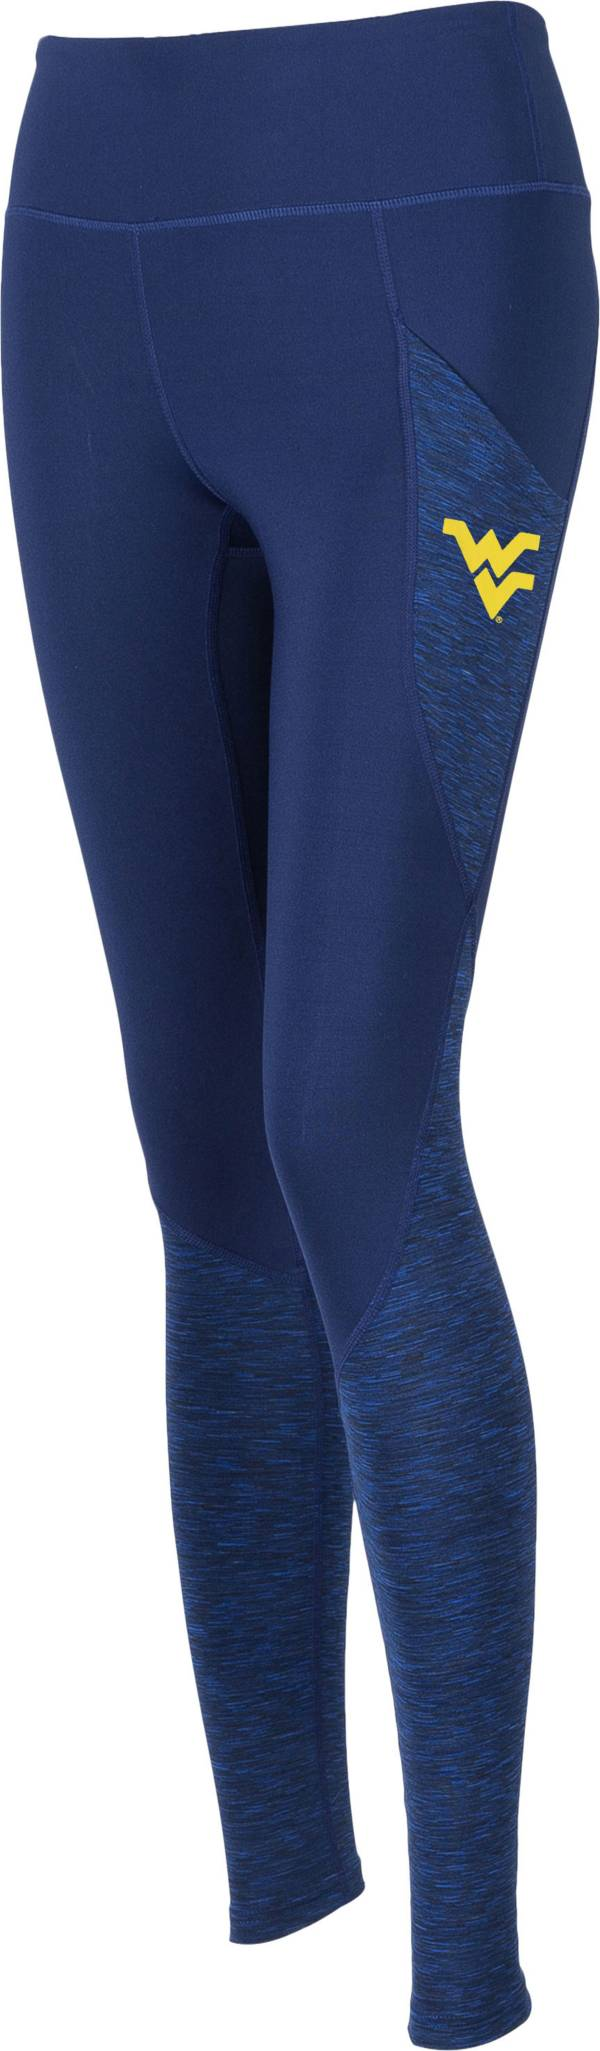 ZooZatz Women's West Virginia Mountaineers Blue Pocket Leggings product image